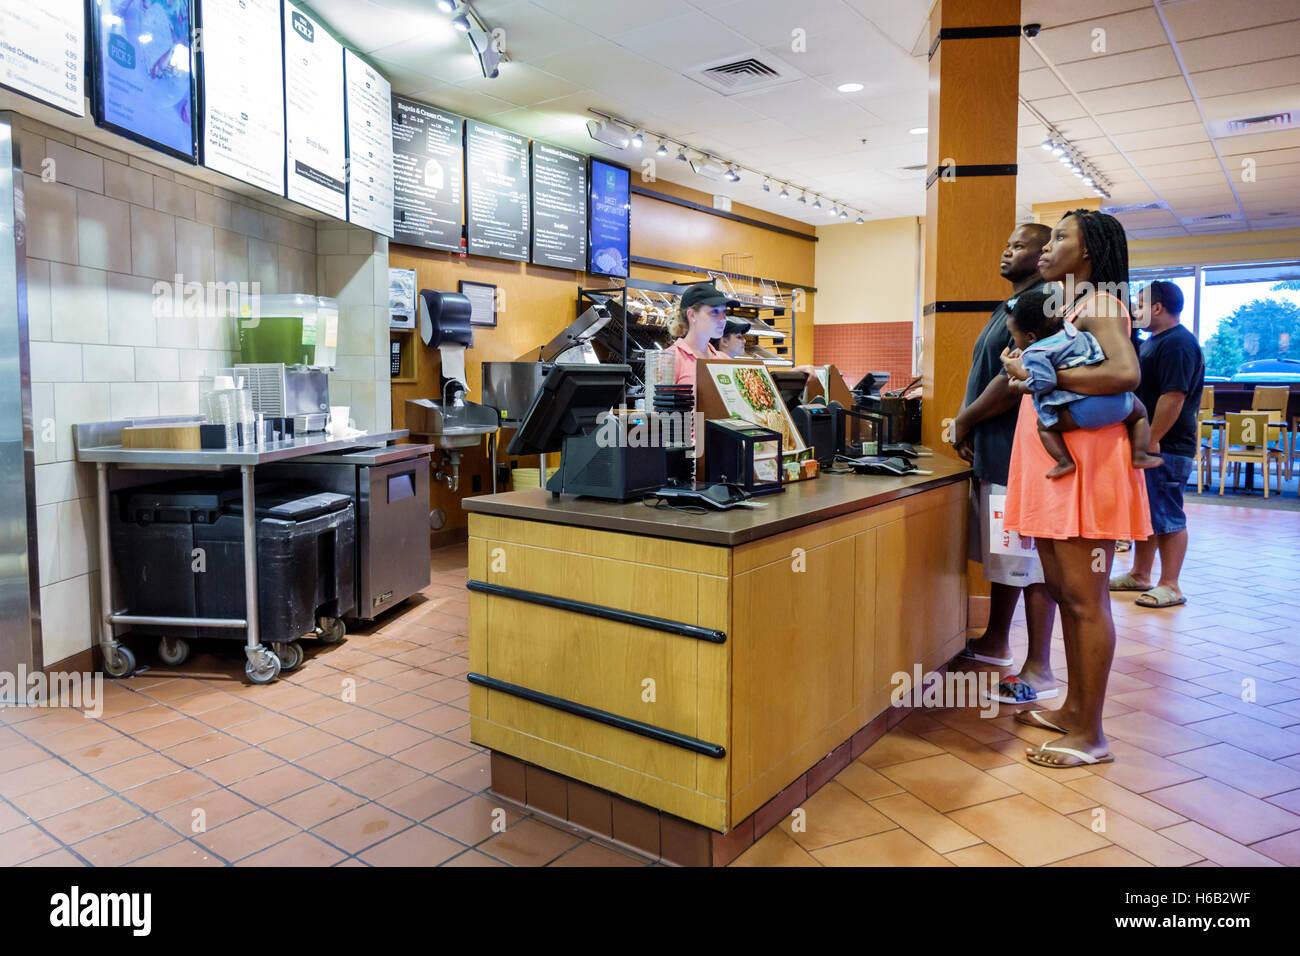 Port St. Lucie Florida Saint Panera Bread interior restaurante contador negro mujer hombre bebé pedido familiar Imagen De Stock